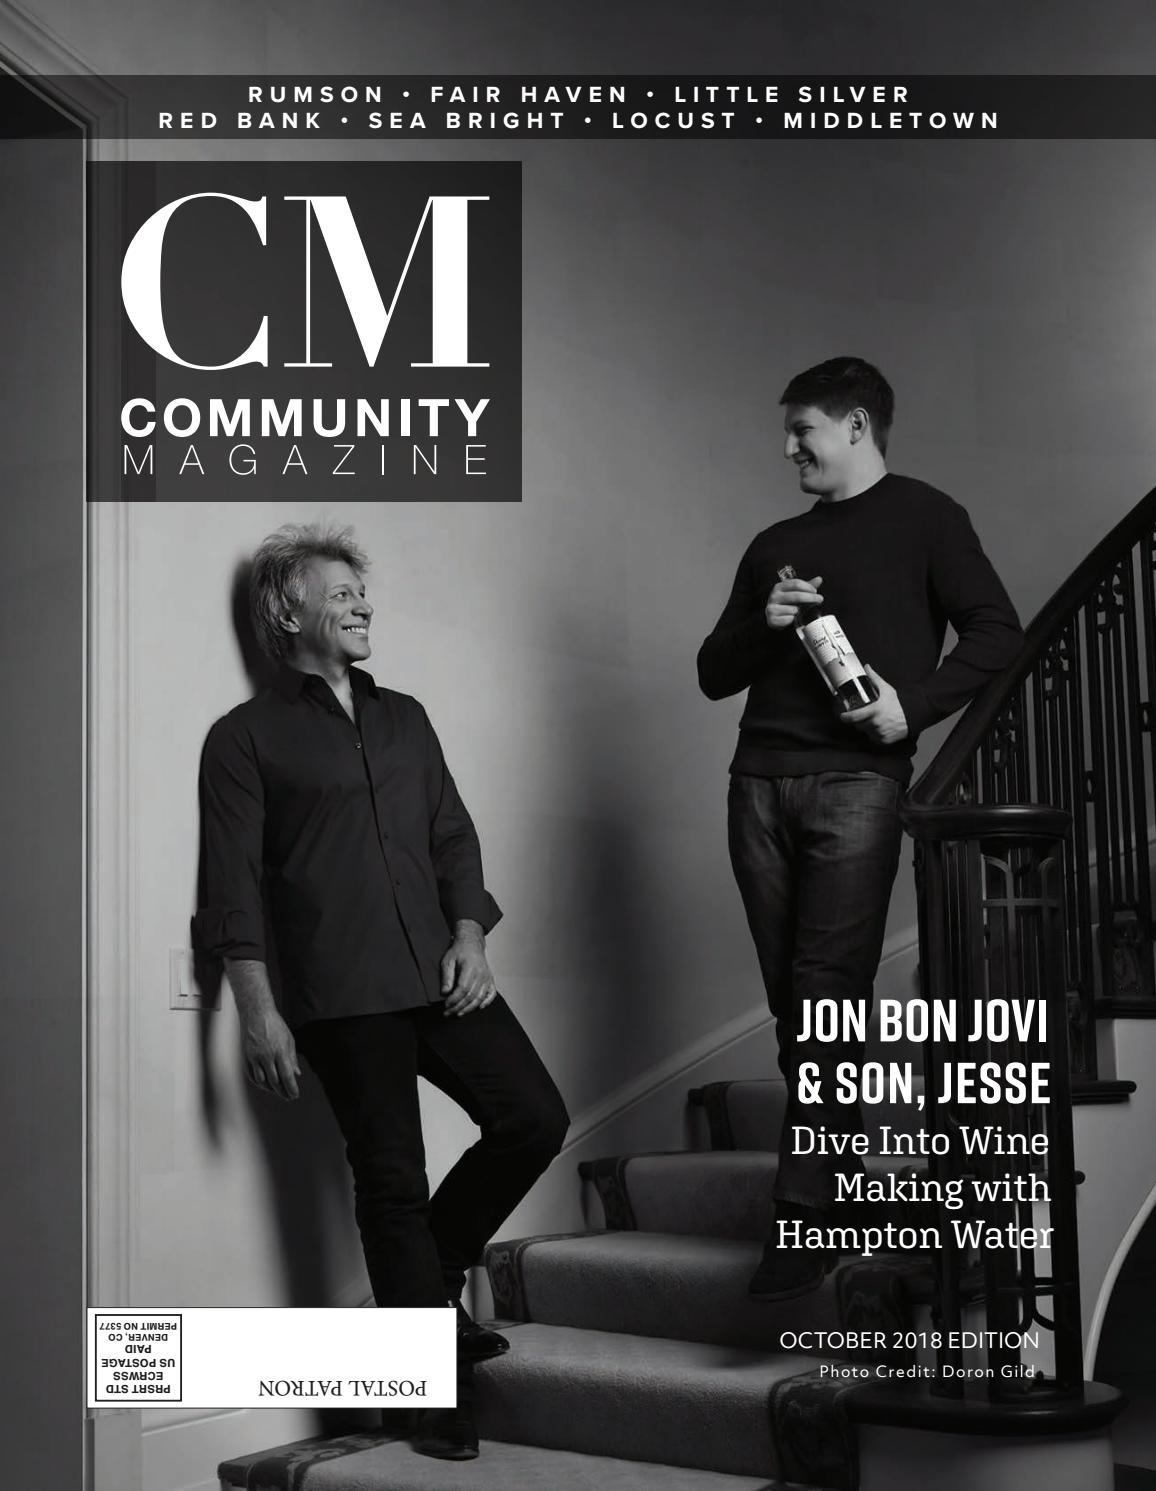 Cm Rumson Fair Haven Little Silver Red Bank Locust Sea Bright October 2018 By Community Magazine Nj Issuu